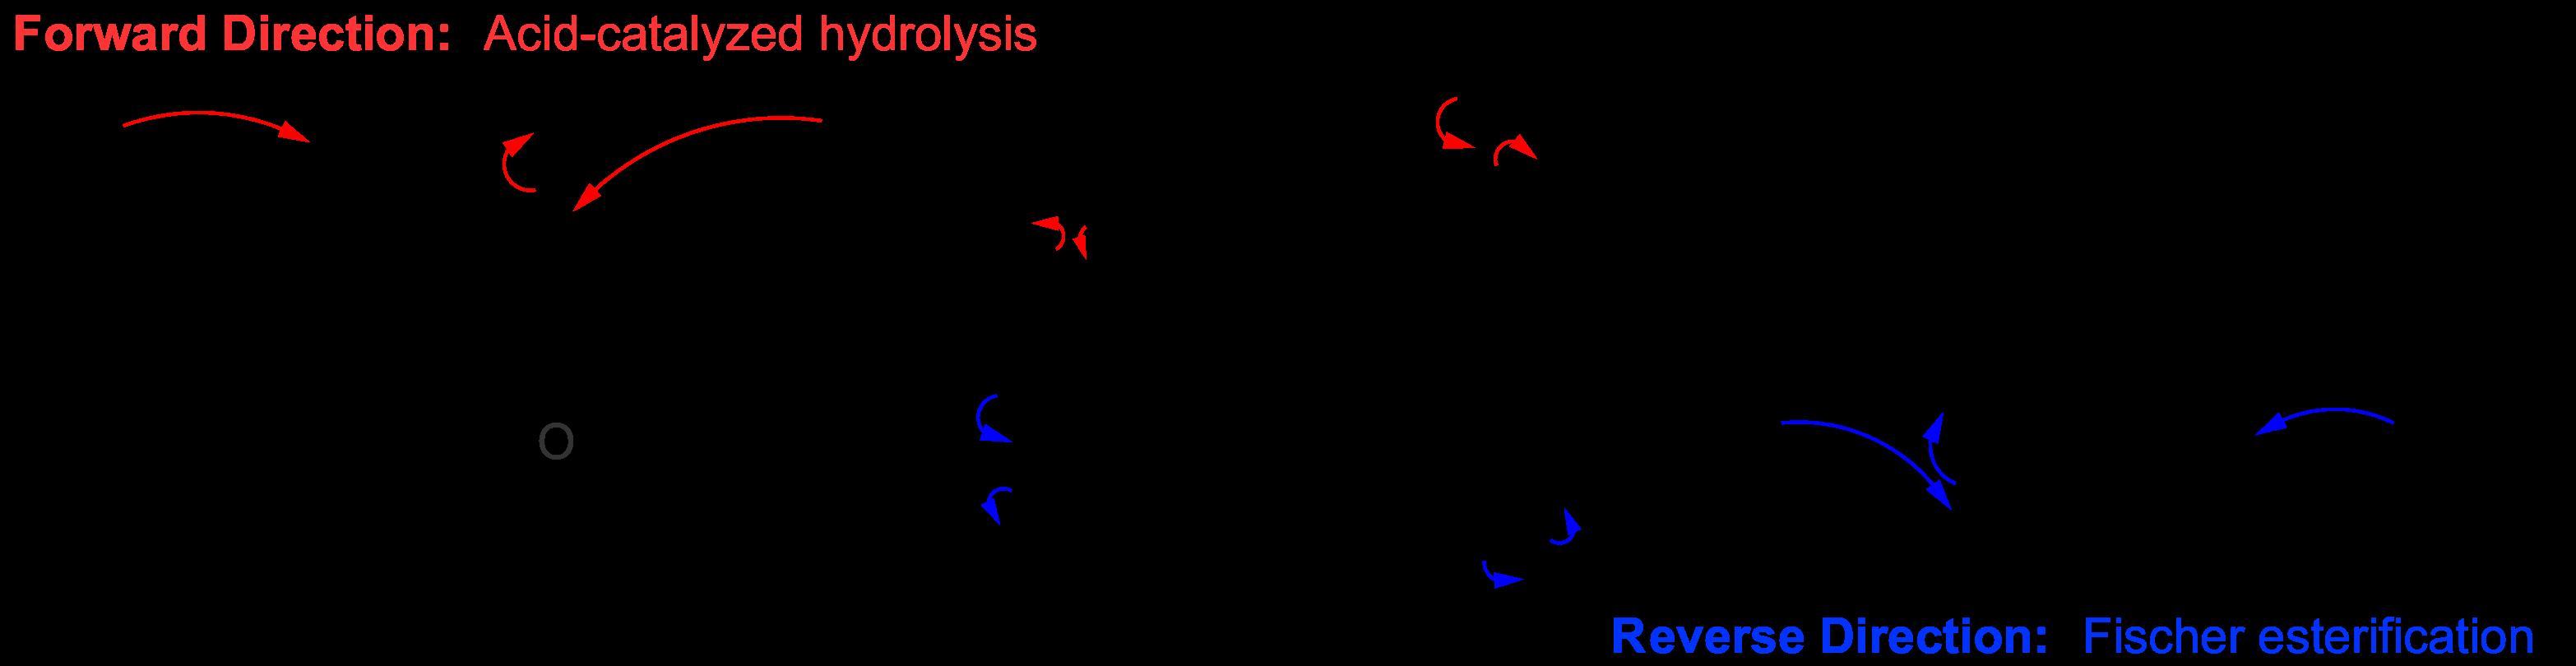 File:Fischer Esterification-Hydrolysis Equilibrium.png